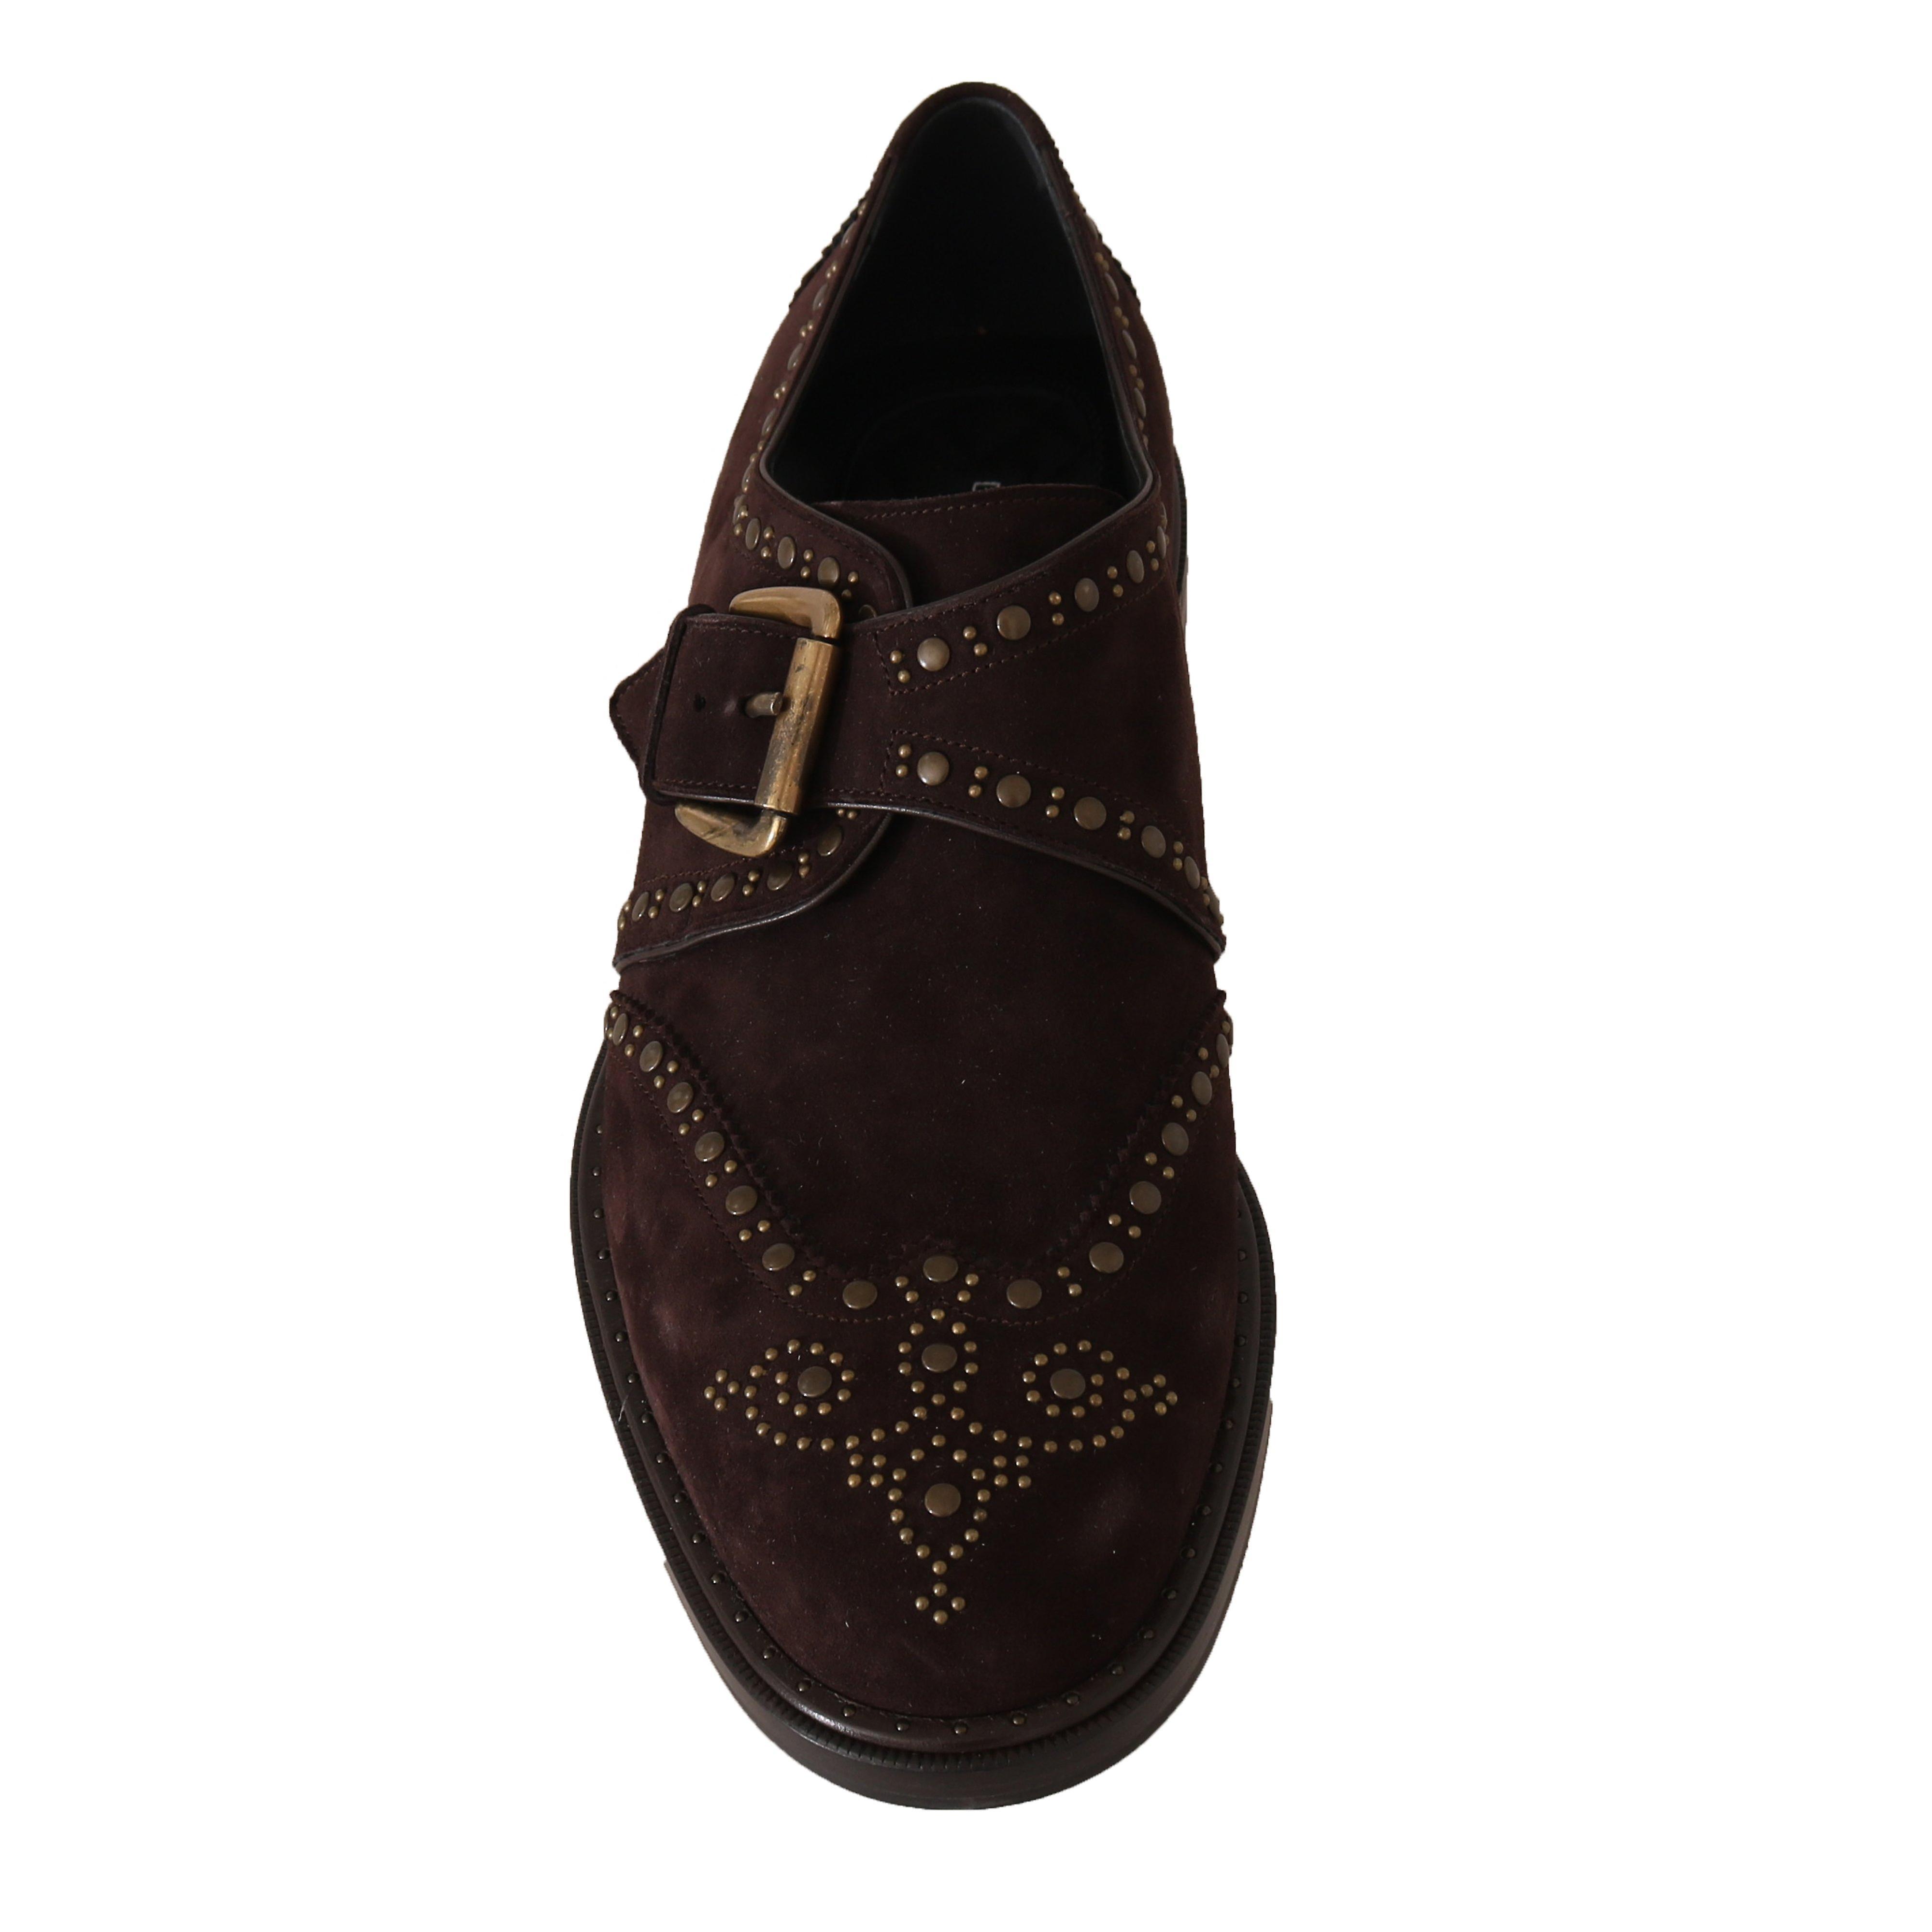 Dolce et Gabbana Brown Suede Monkstrap Silver Studded Chaussures -- MV19639856